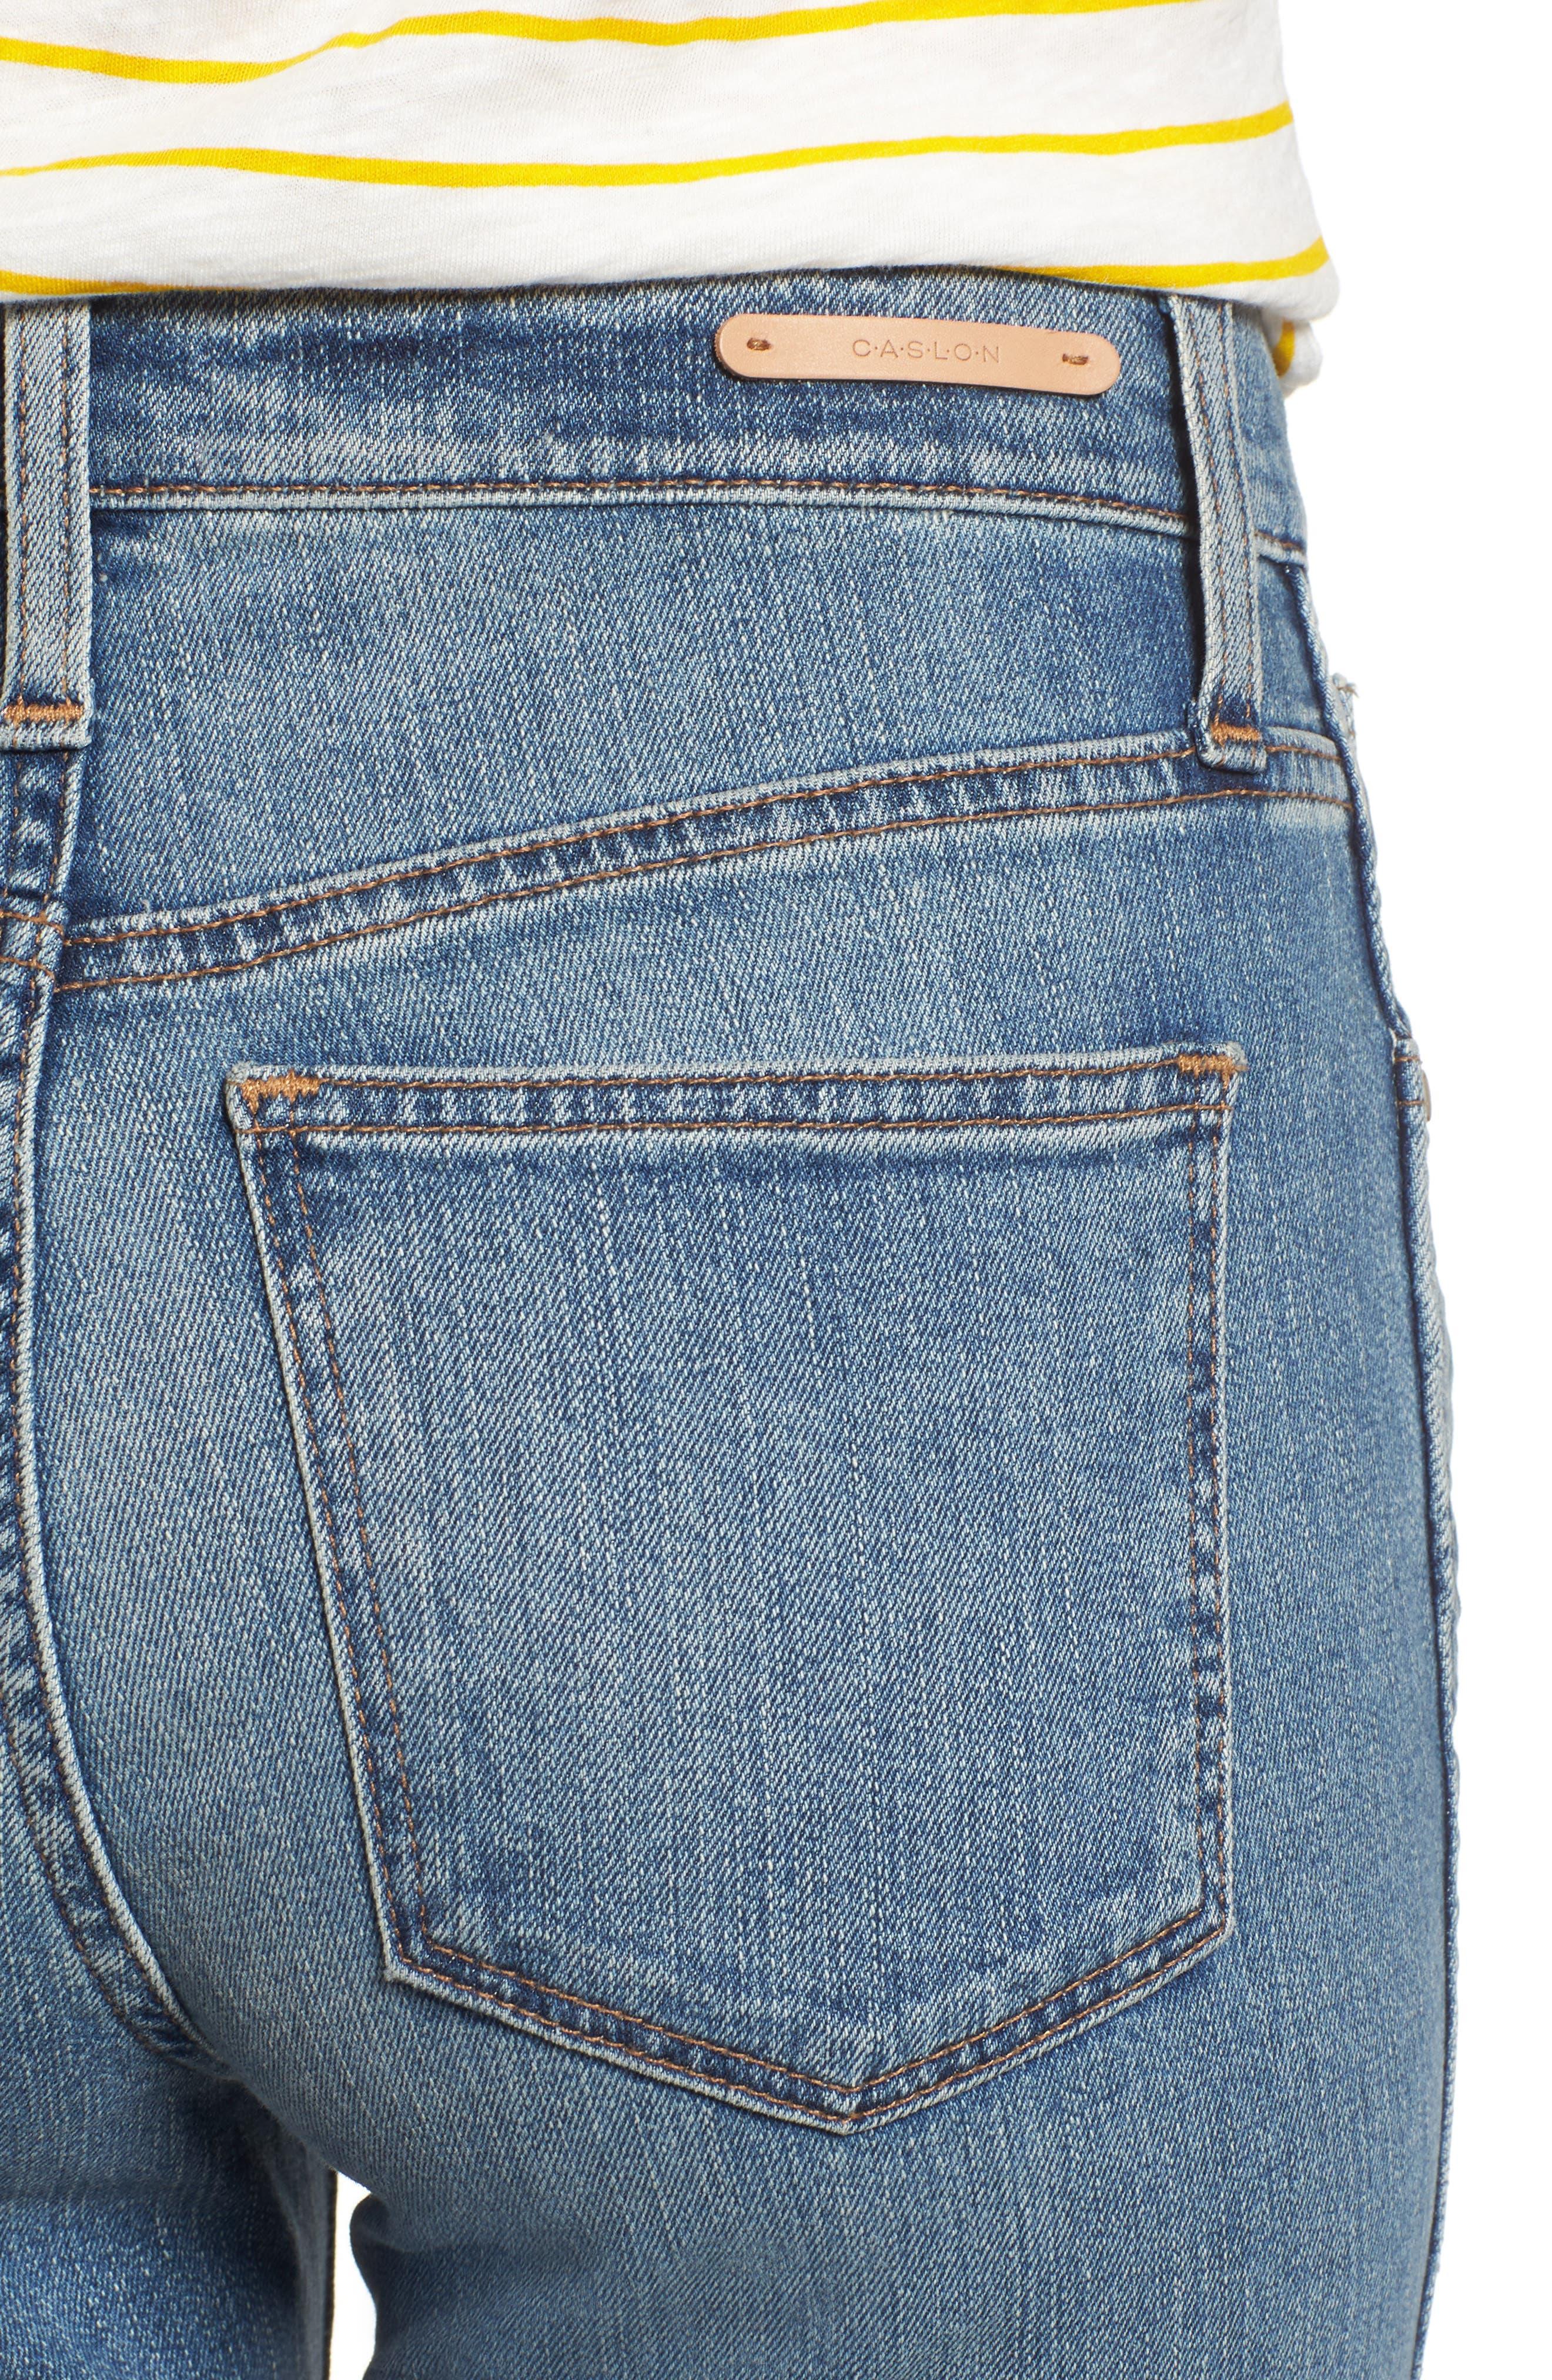 Raw Hem Slim Straight Leg Jeans,                             Alternate thumbnail 4, color,                             420